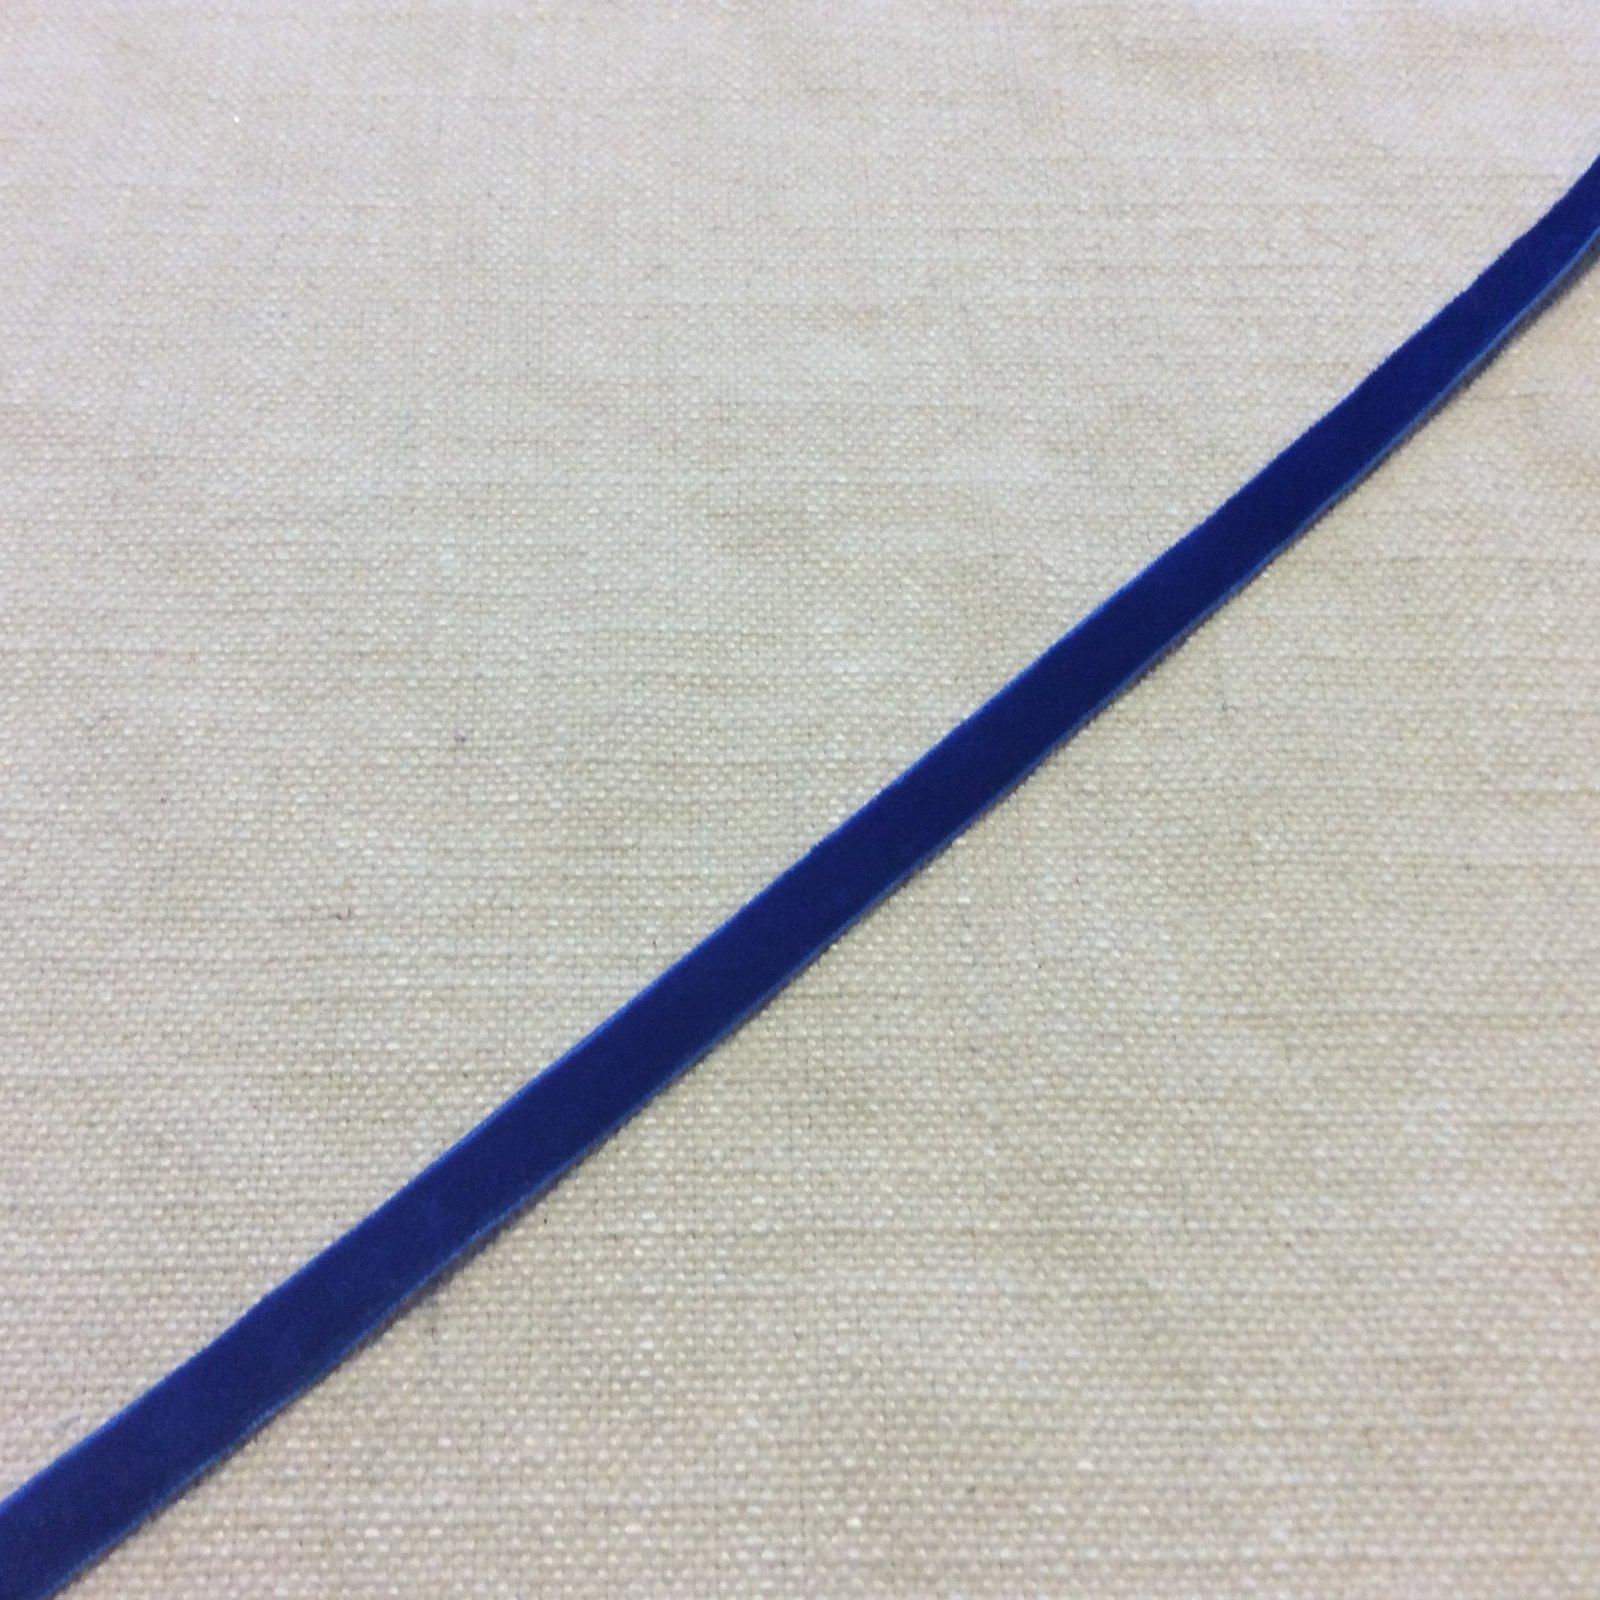 Velvet Ribbon 3/8 Royal Blue Trim Ribbon PAMA14